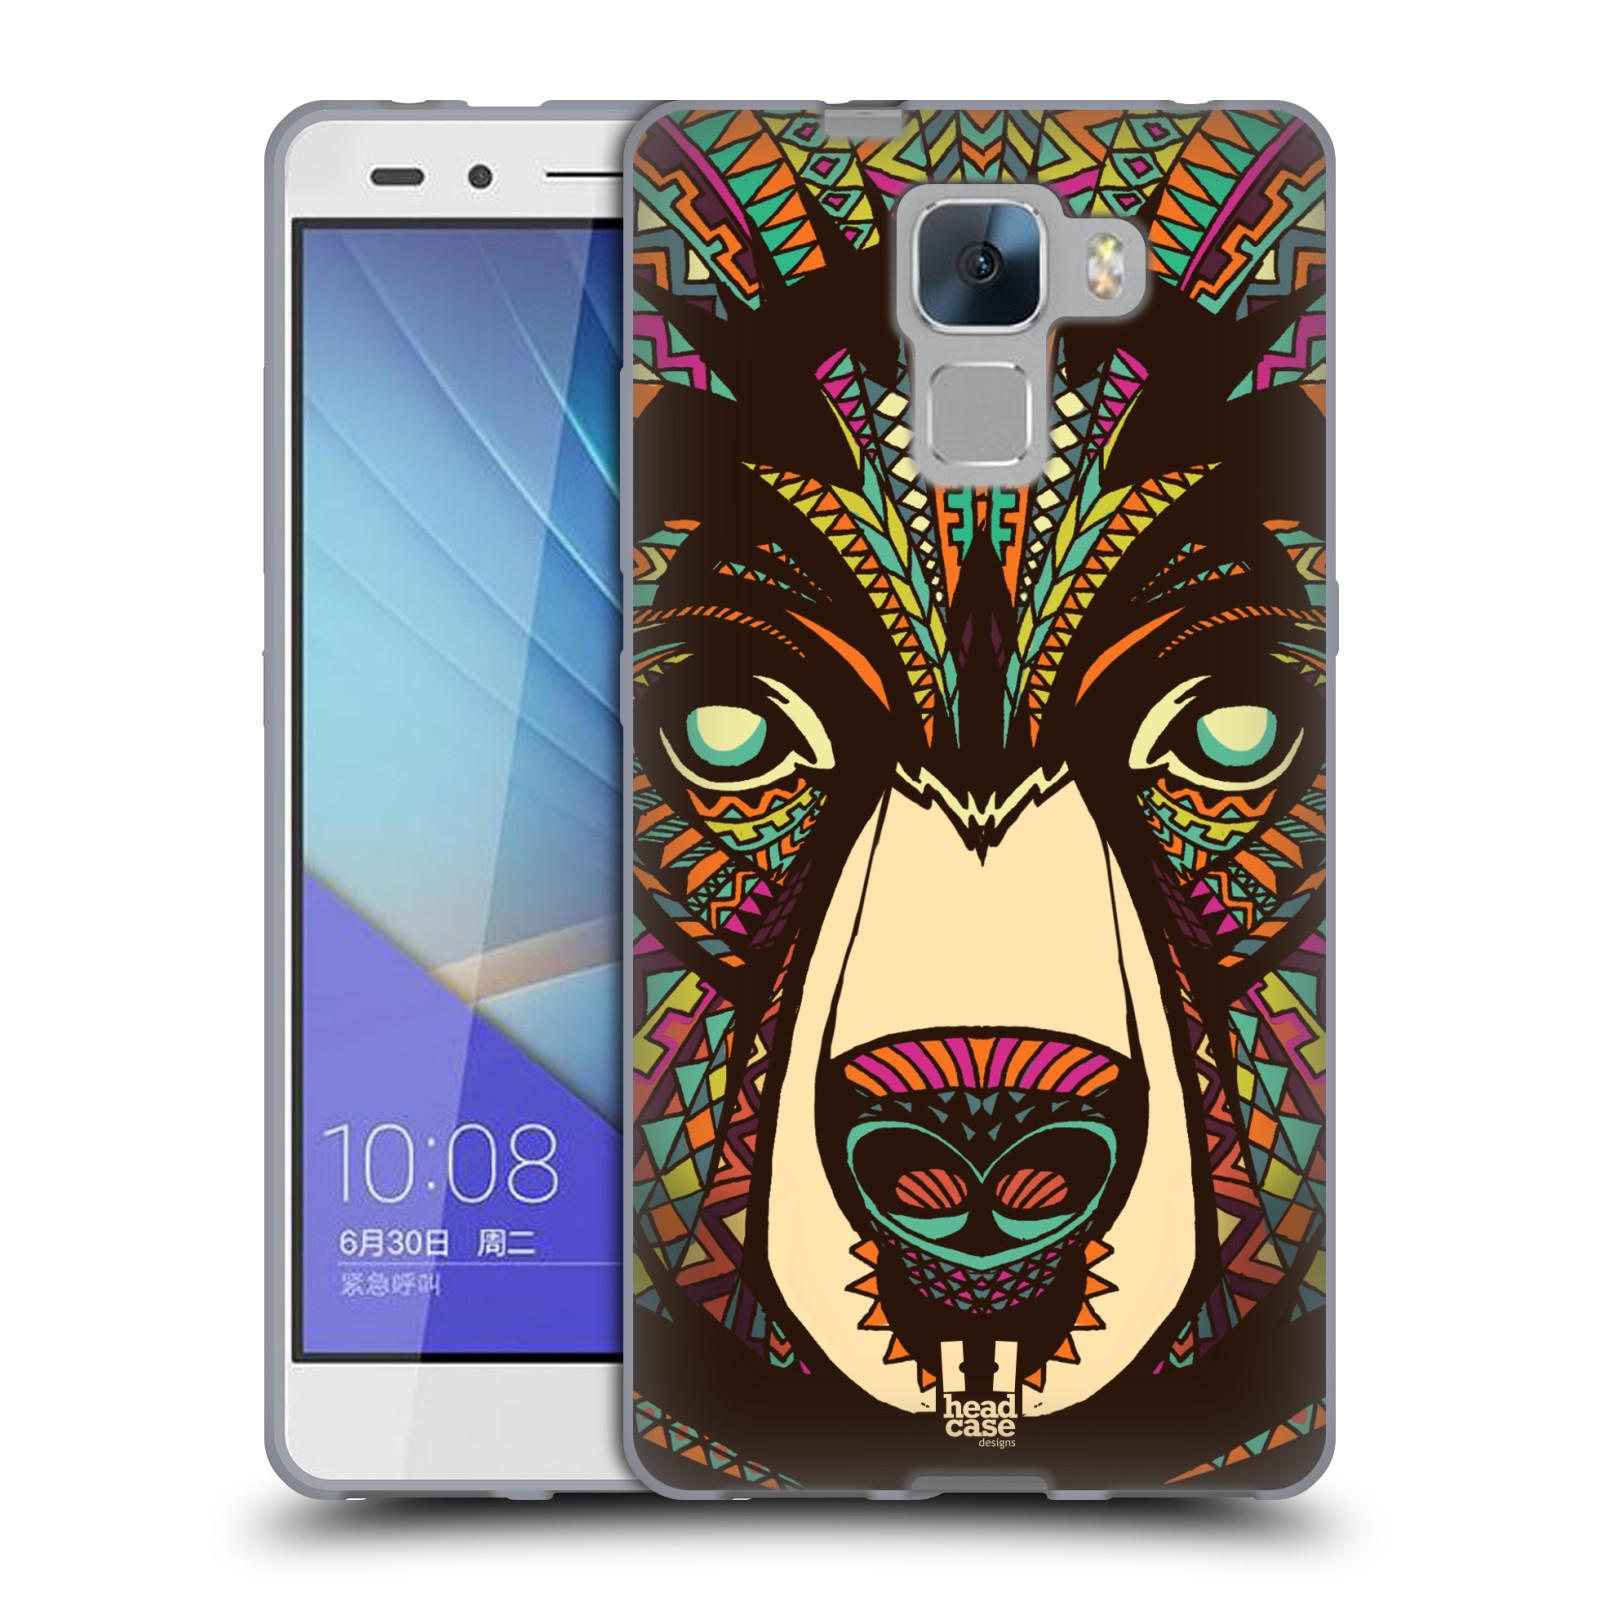 Silikonové pouzdro na mobil Honor 7 HEAD CASE AZTEC MEDVĚD